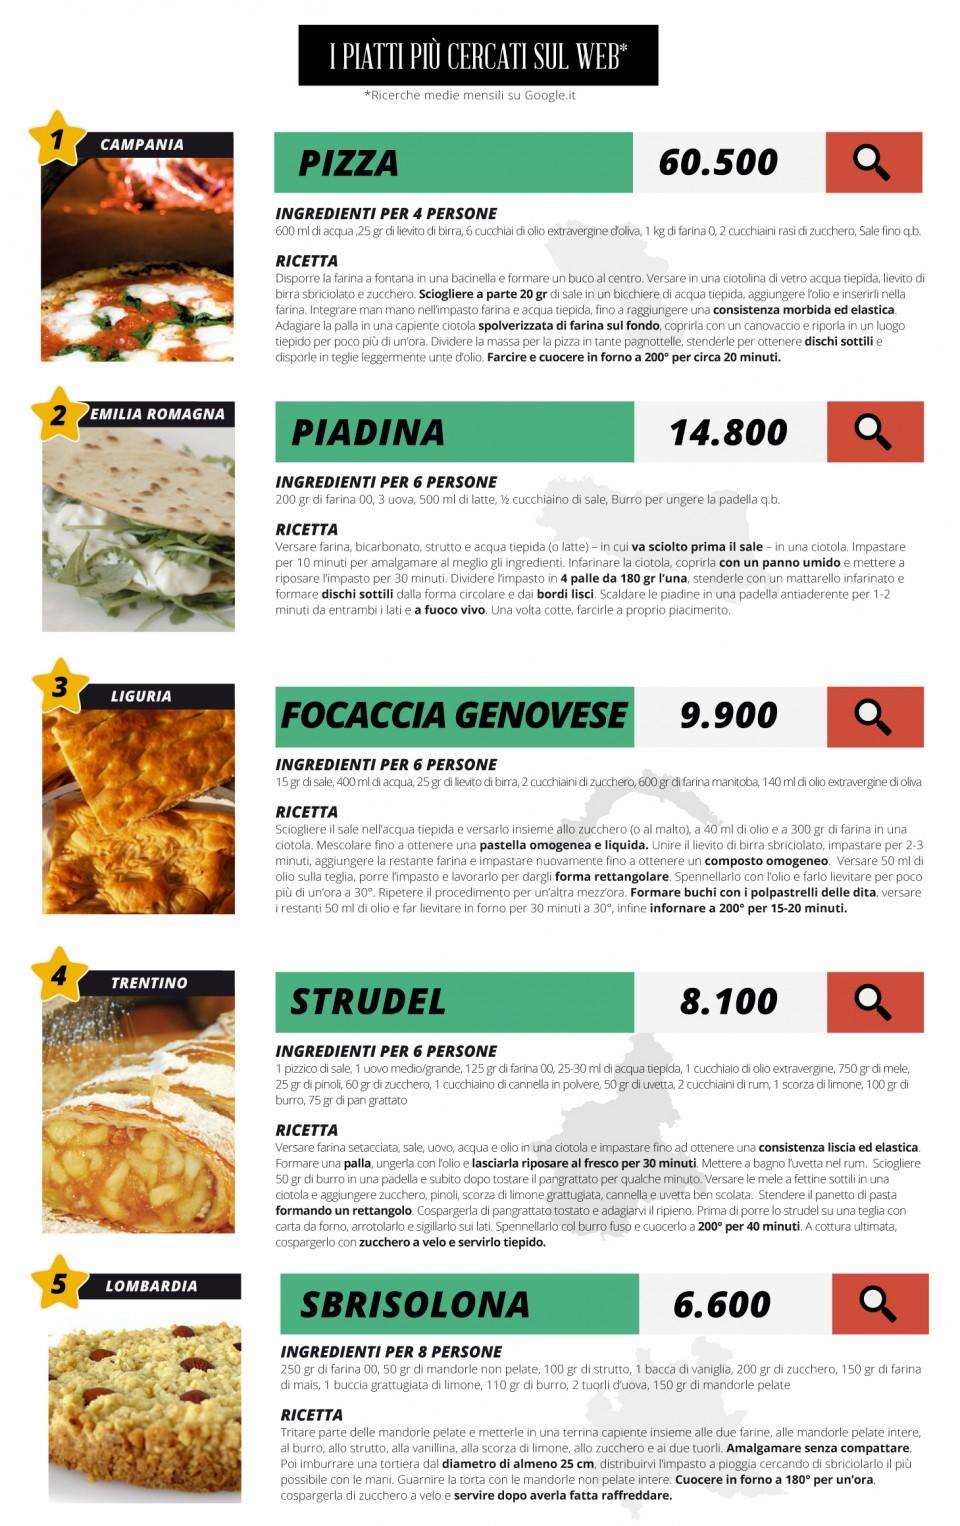 5 street food più cercati del web